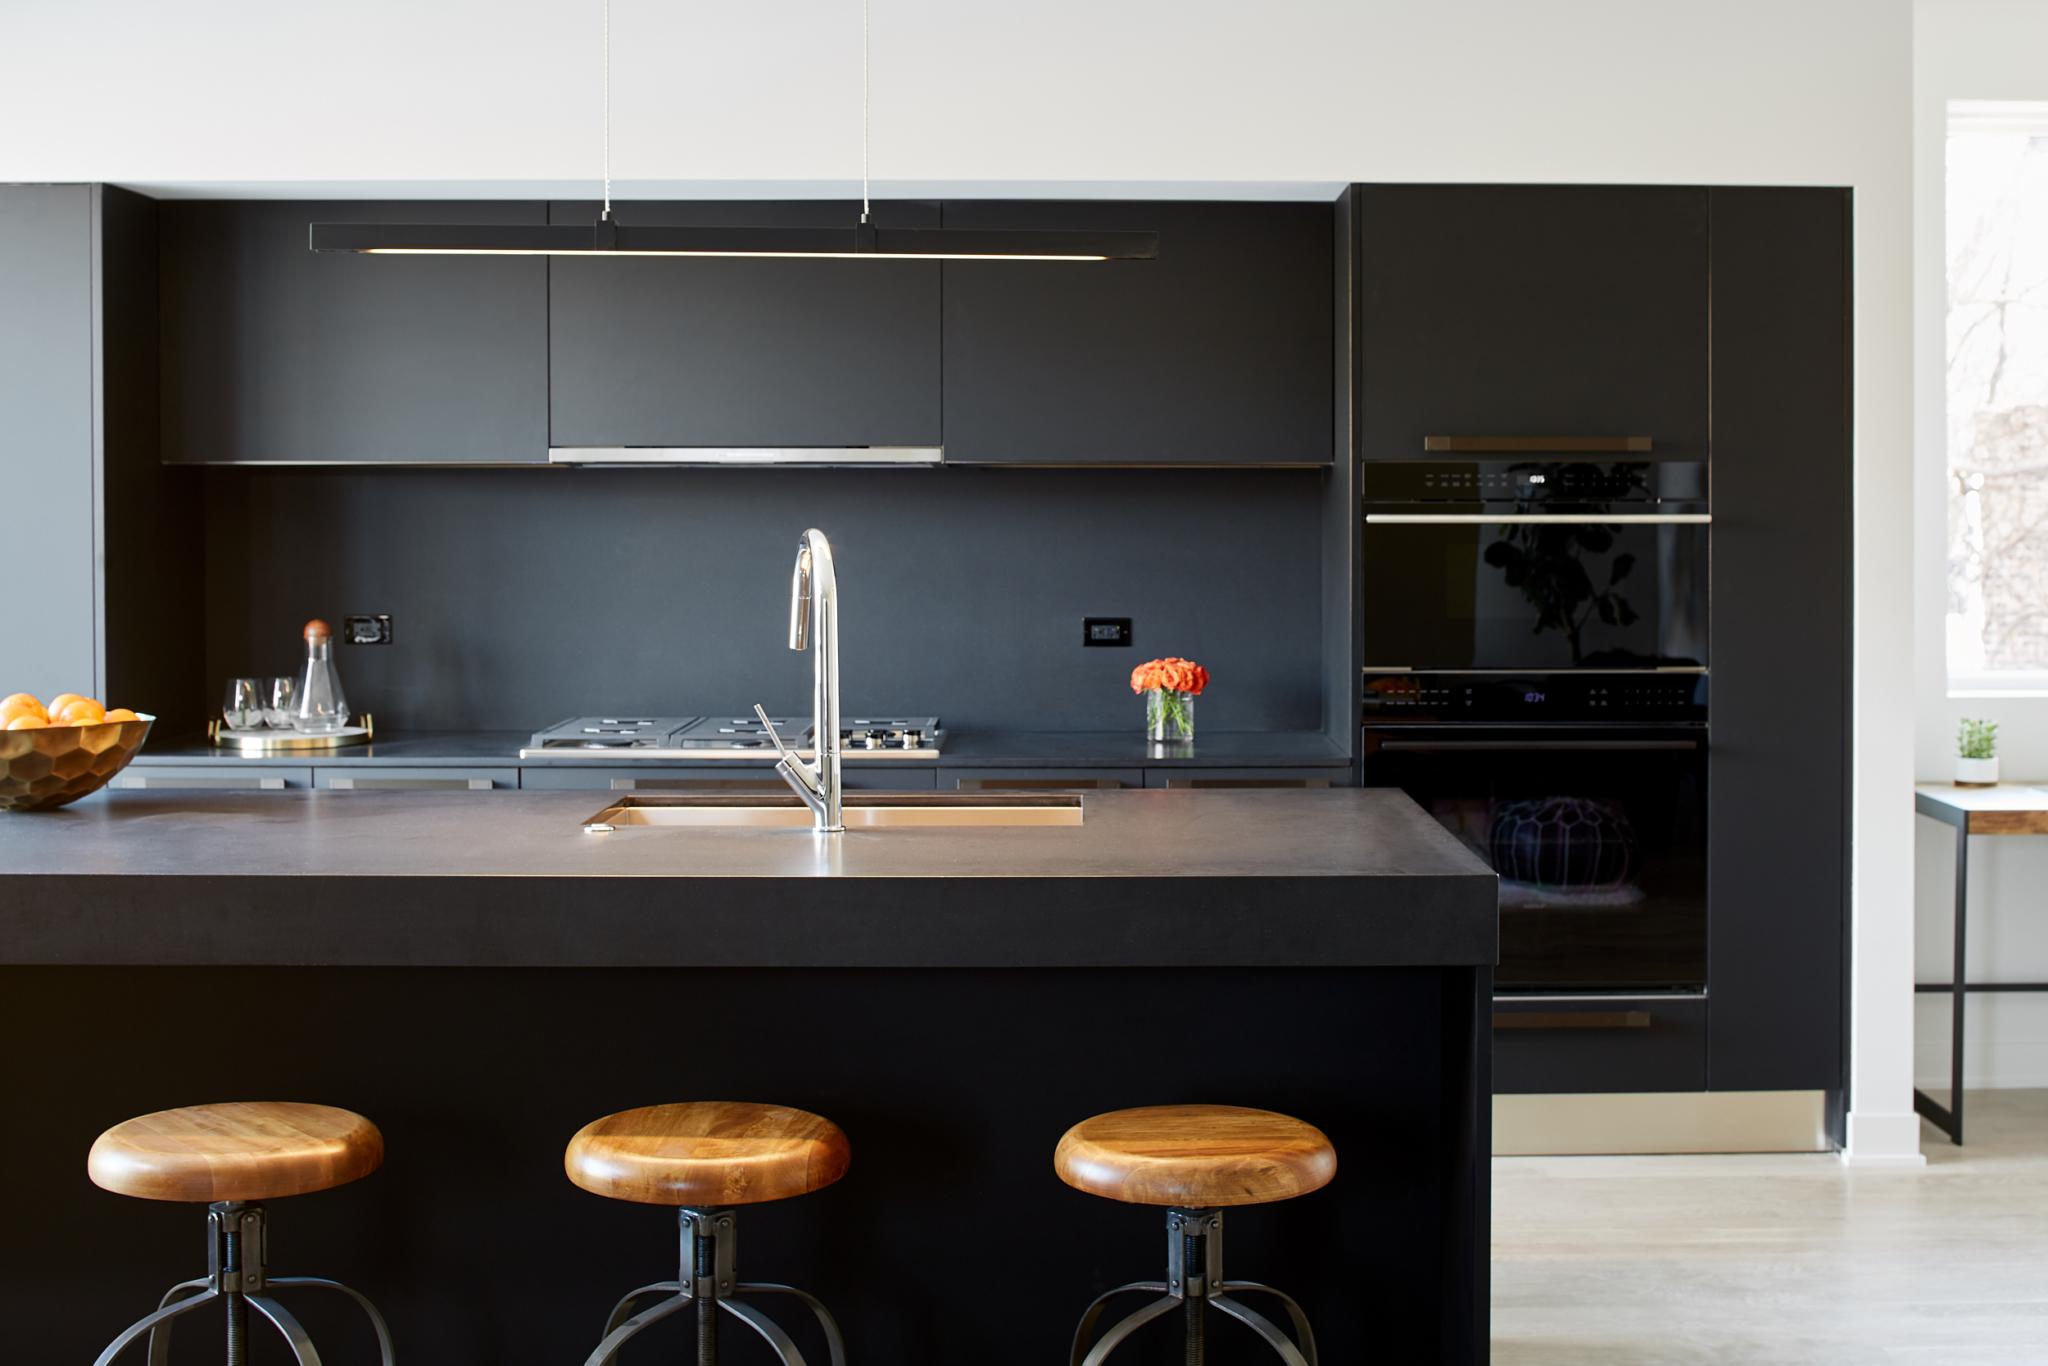 530Dickens_Kitchen_B_3-scaled.jpg